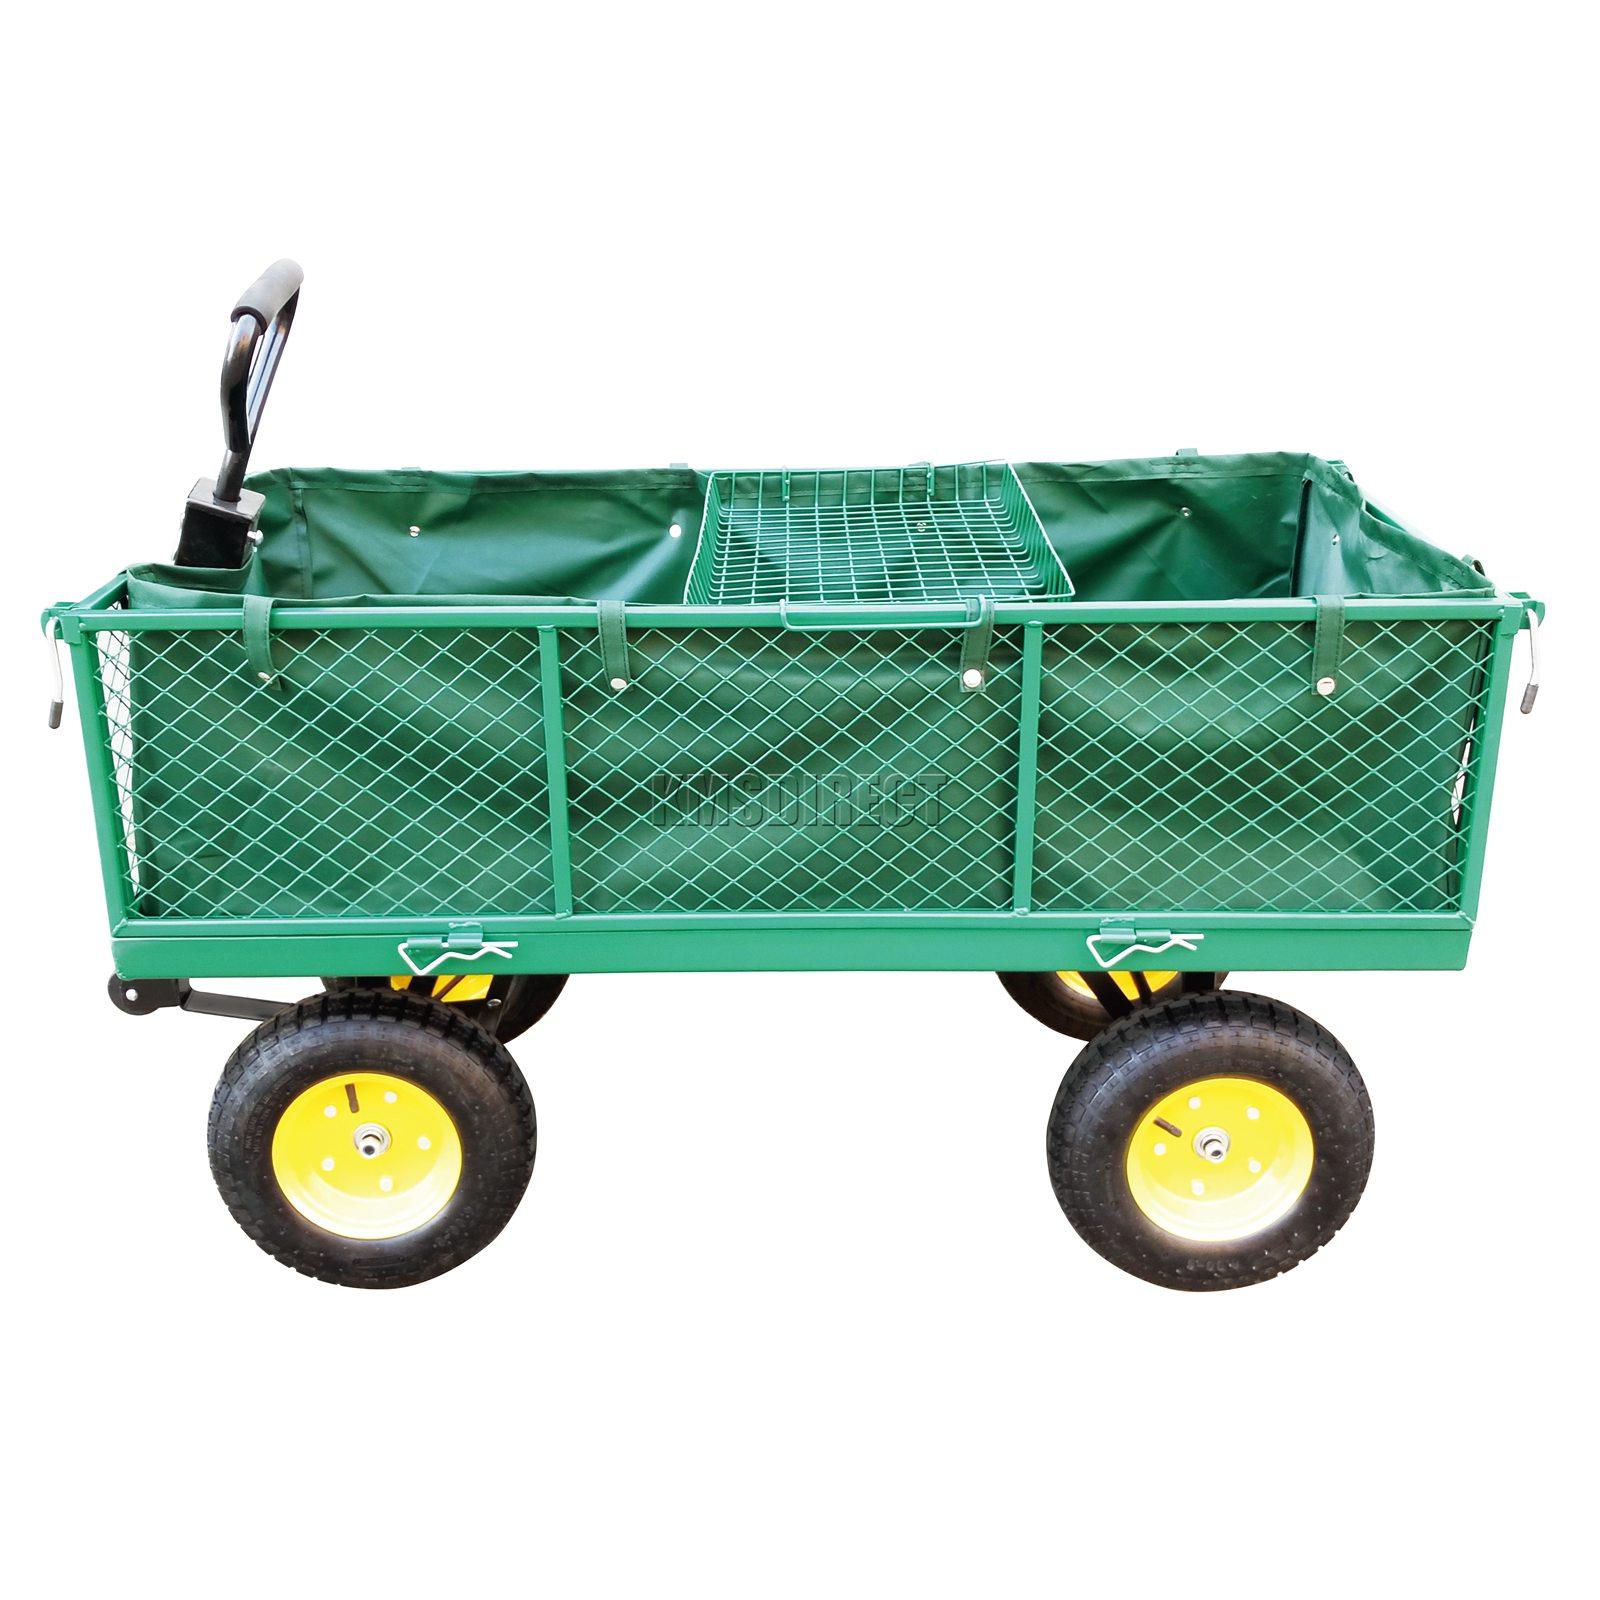 FoxHunter-Heavy-Duty-Garden-Dump-Truck-Tipping-Trailer-Trolley-Cart-Wheelbarrow miniatuur 24